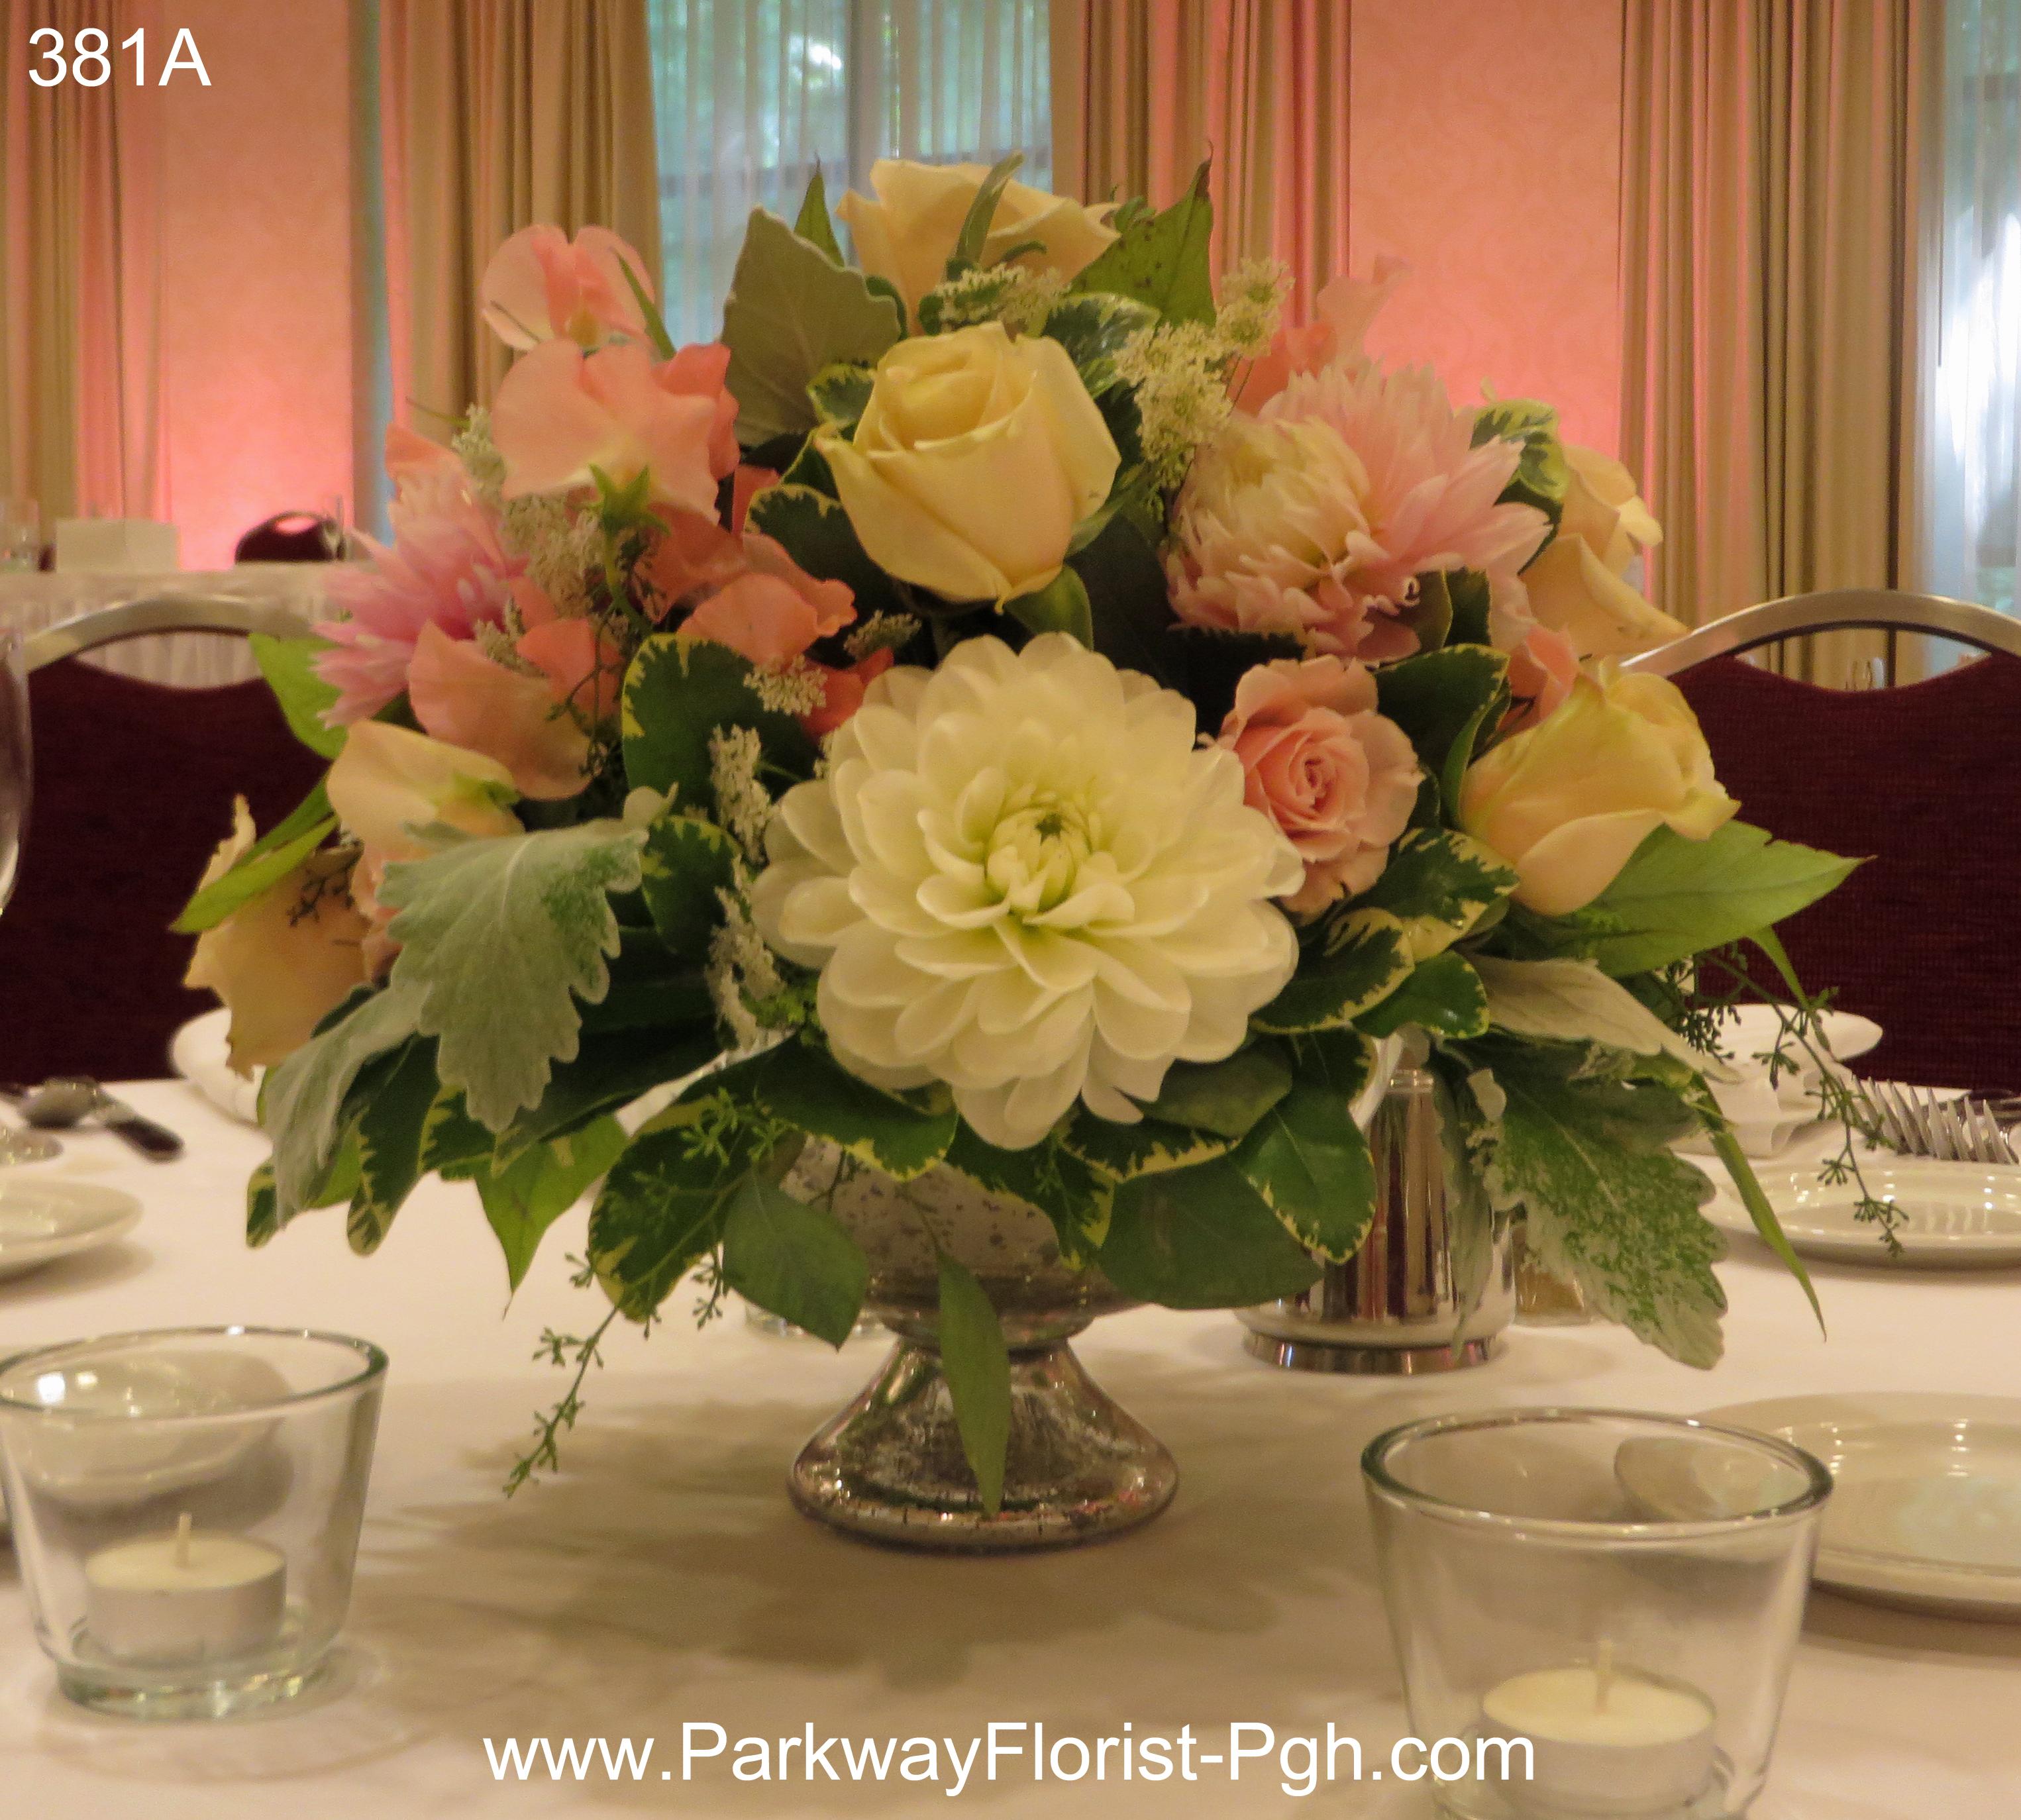 dahlias   Parkway Florist Pittsburgh Blog